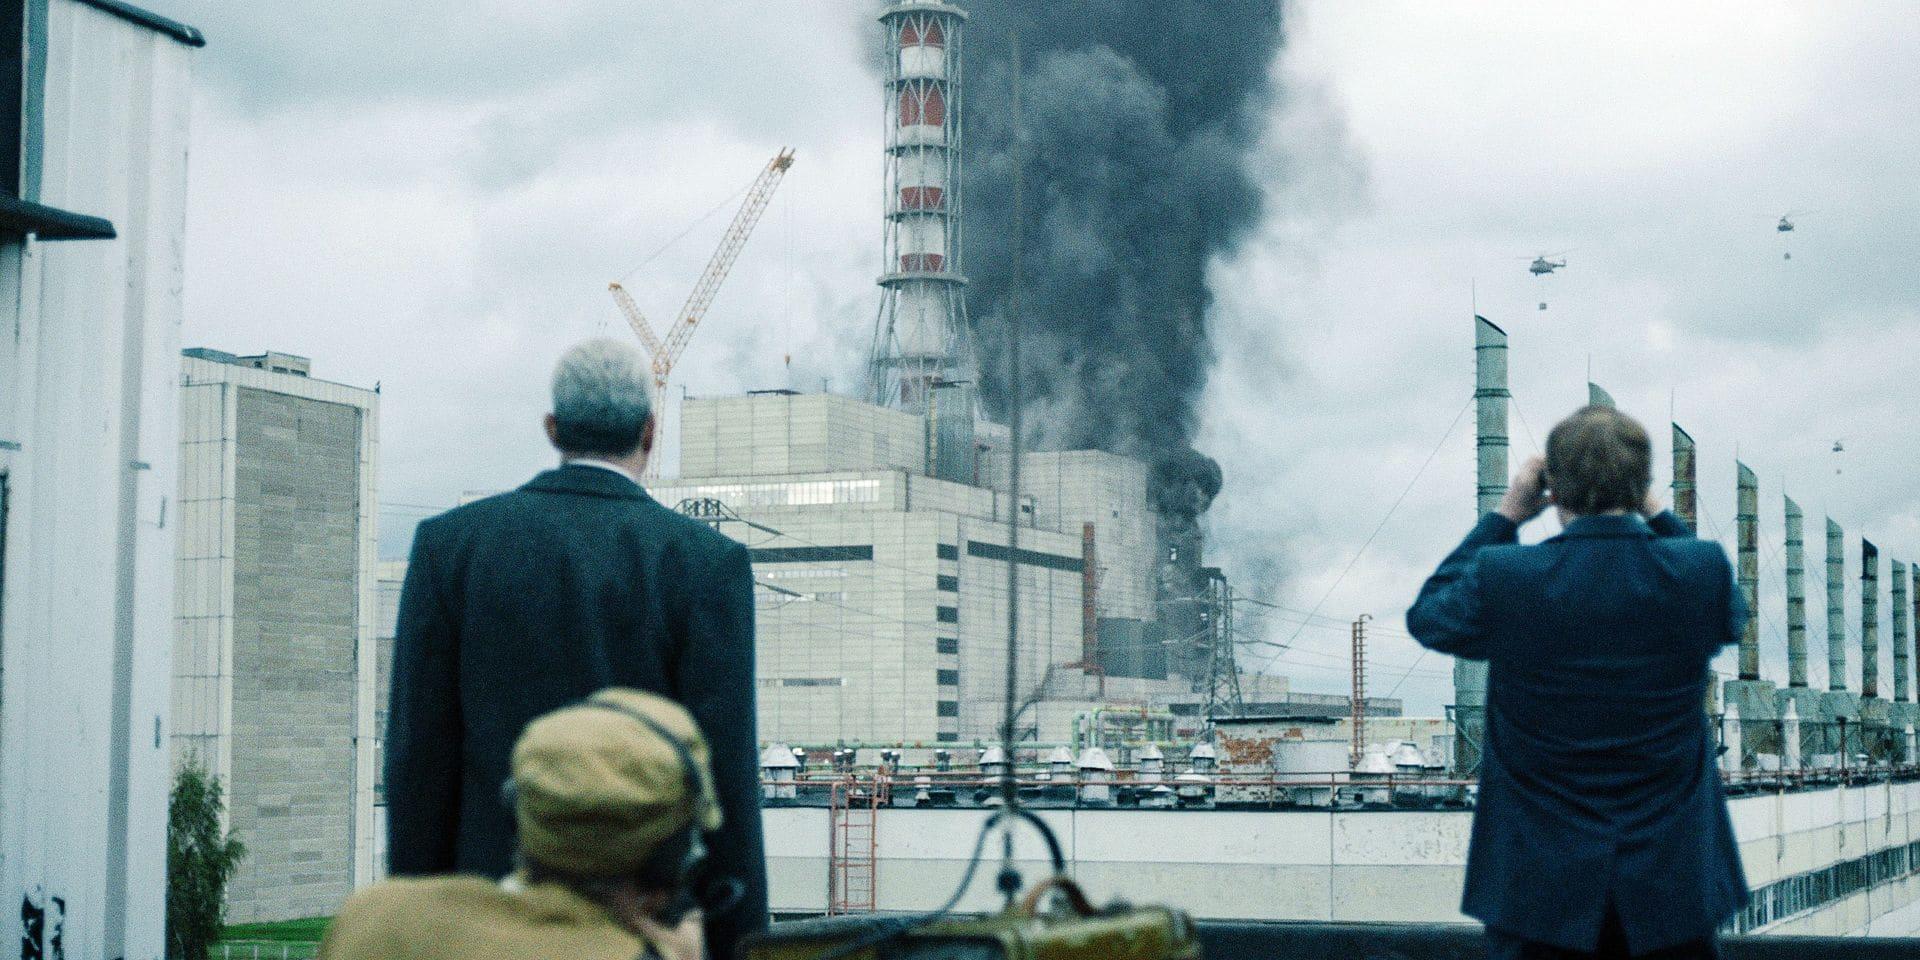 Chernobyl, Game of Thrones, Downtown Abbey : ces séries qui boostent le tourisme